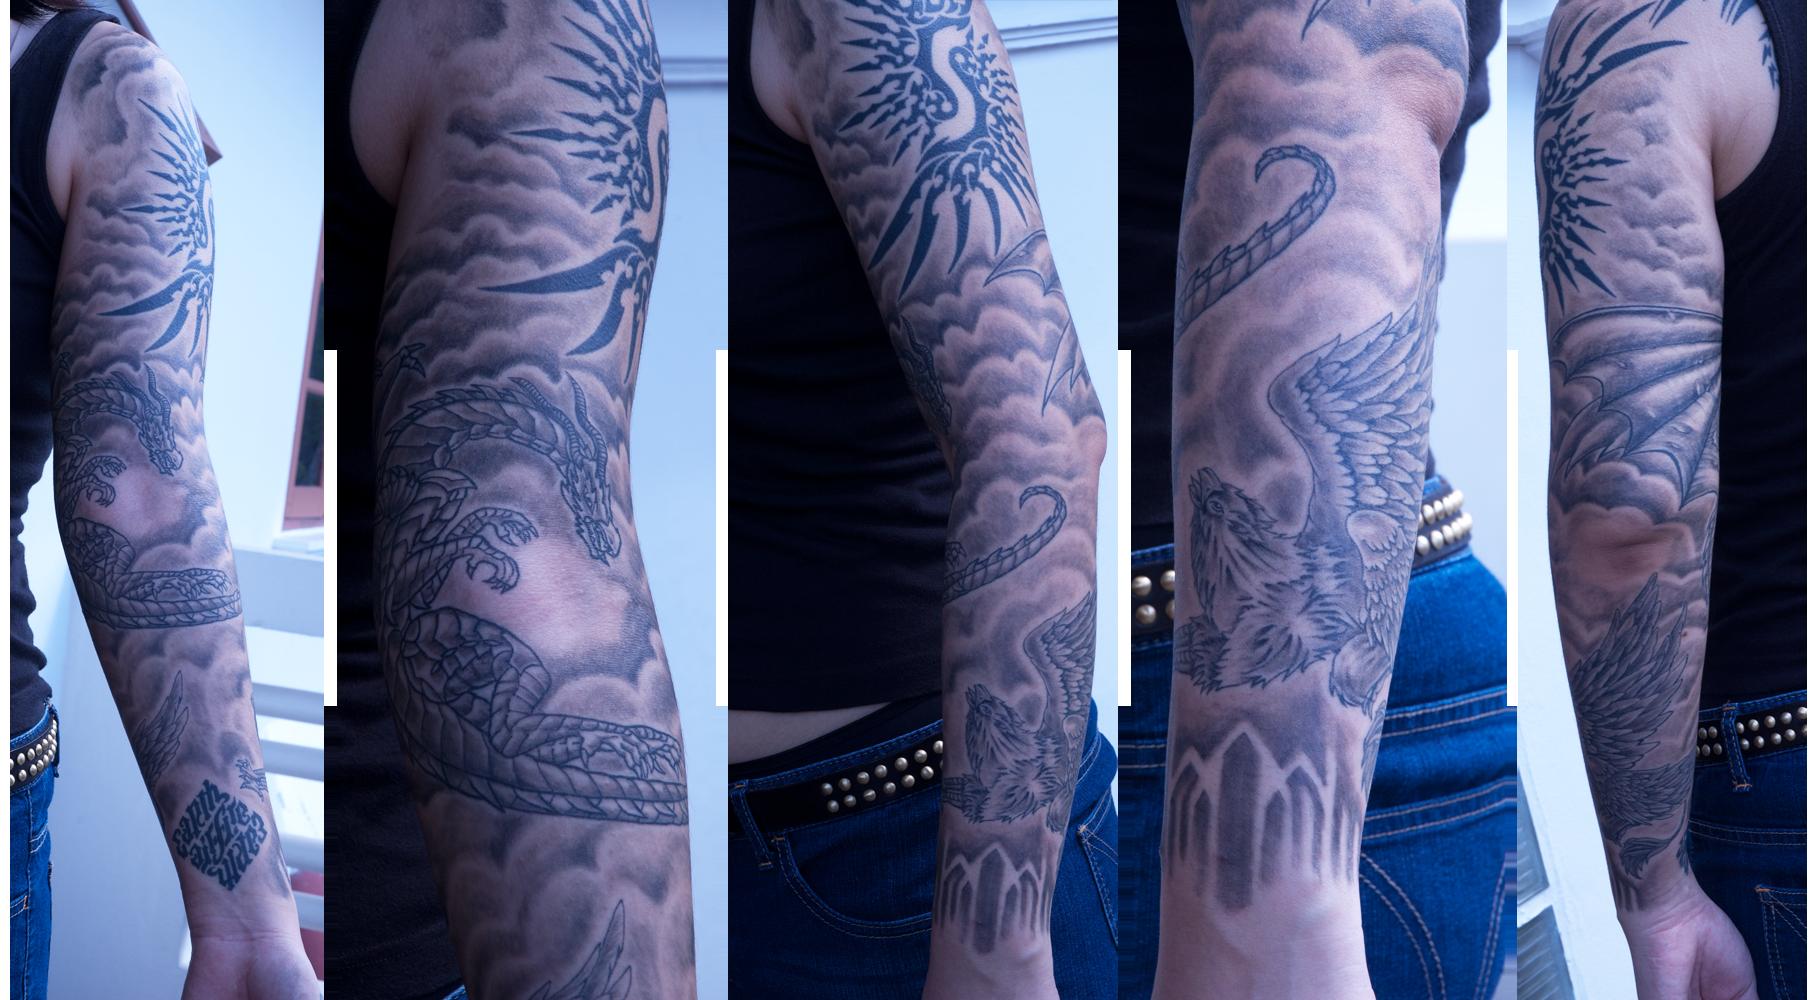 My full sleeve tattoo by sigisfeld on deviantart for Full sleeve tattoo clouds